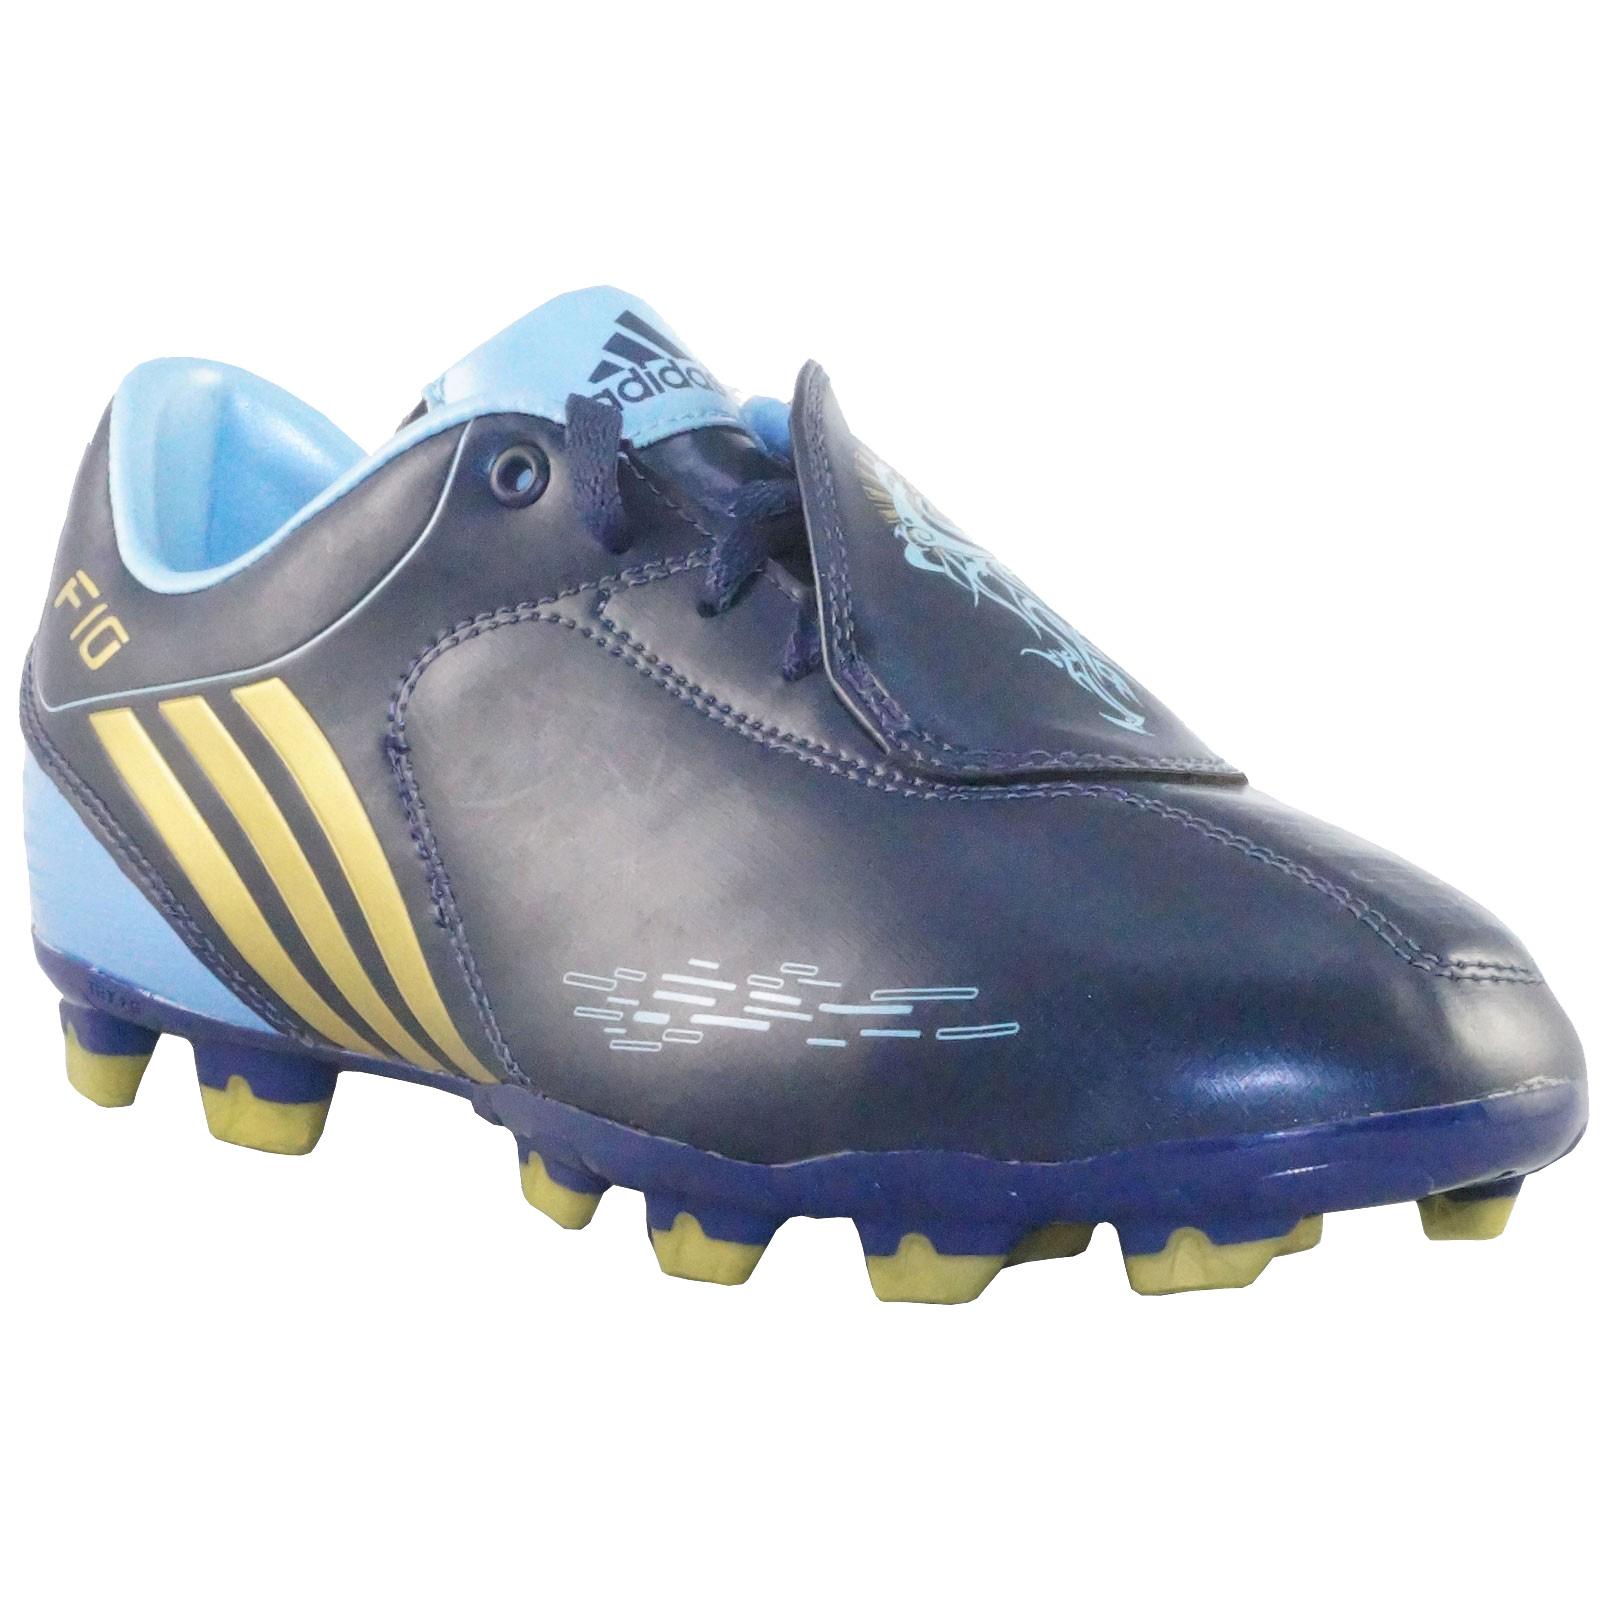 best service 2b310 008c9 Adidas F10 I TRX FG J G02221 Soccer shoes blue gold